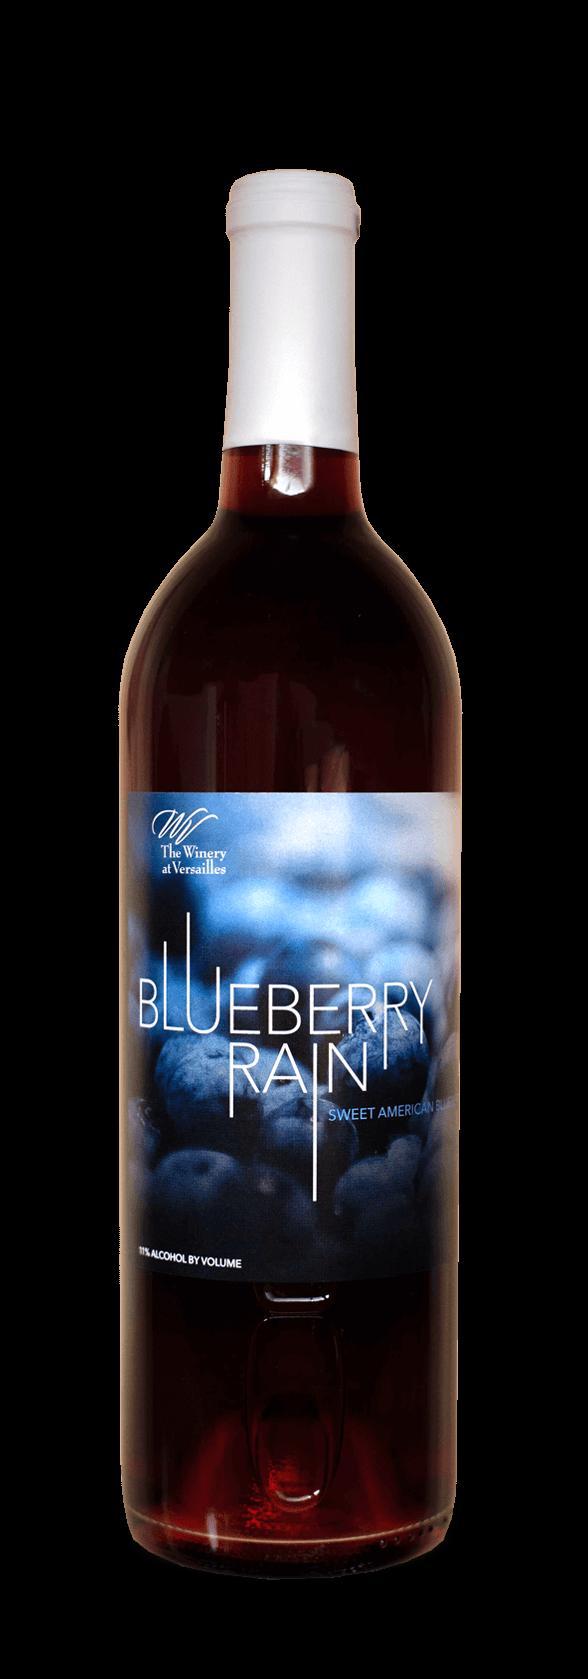 Blueberry Rain